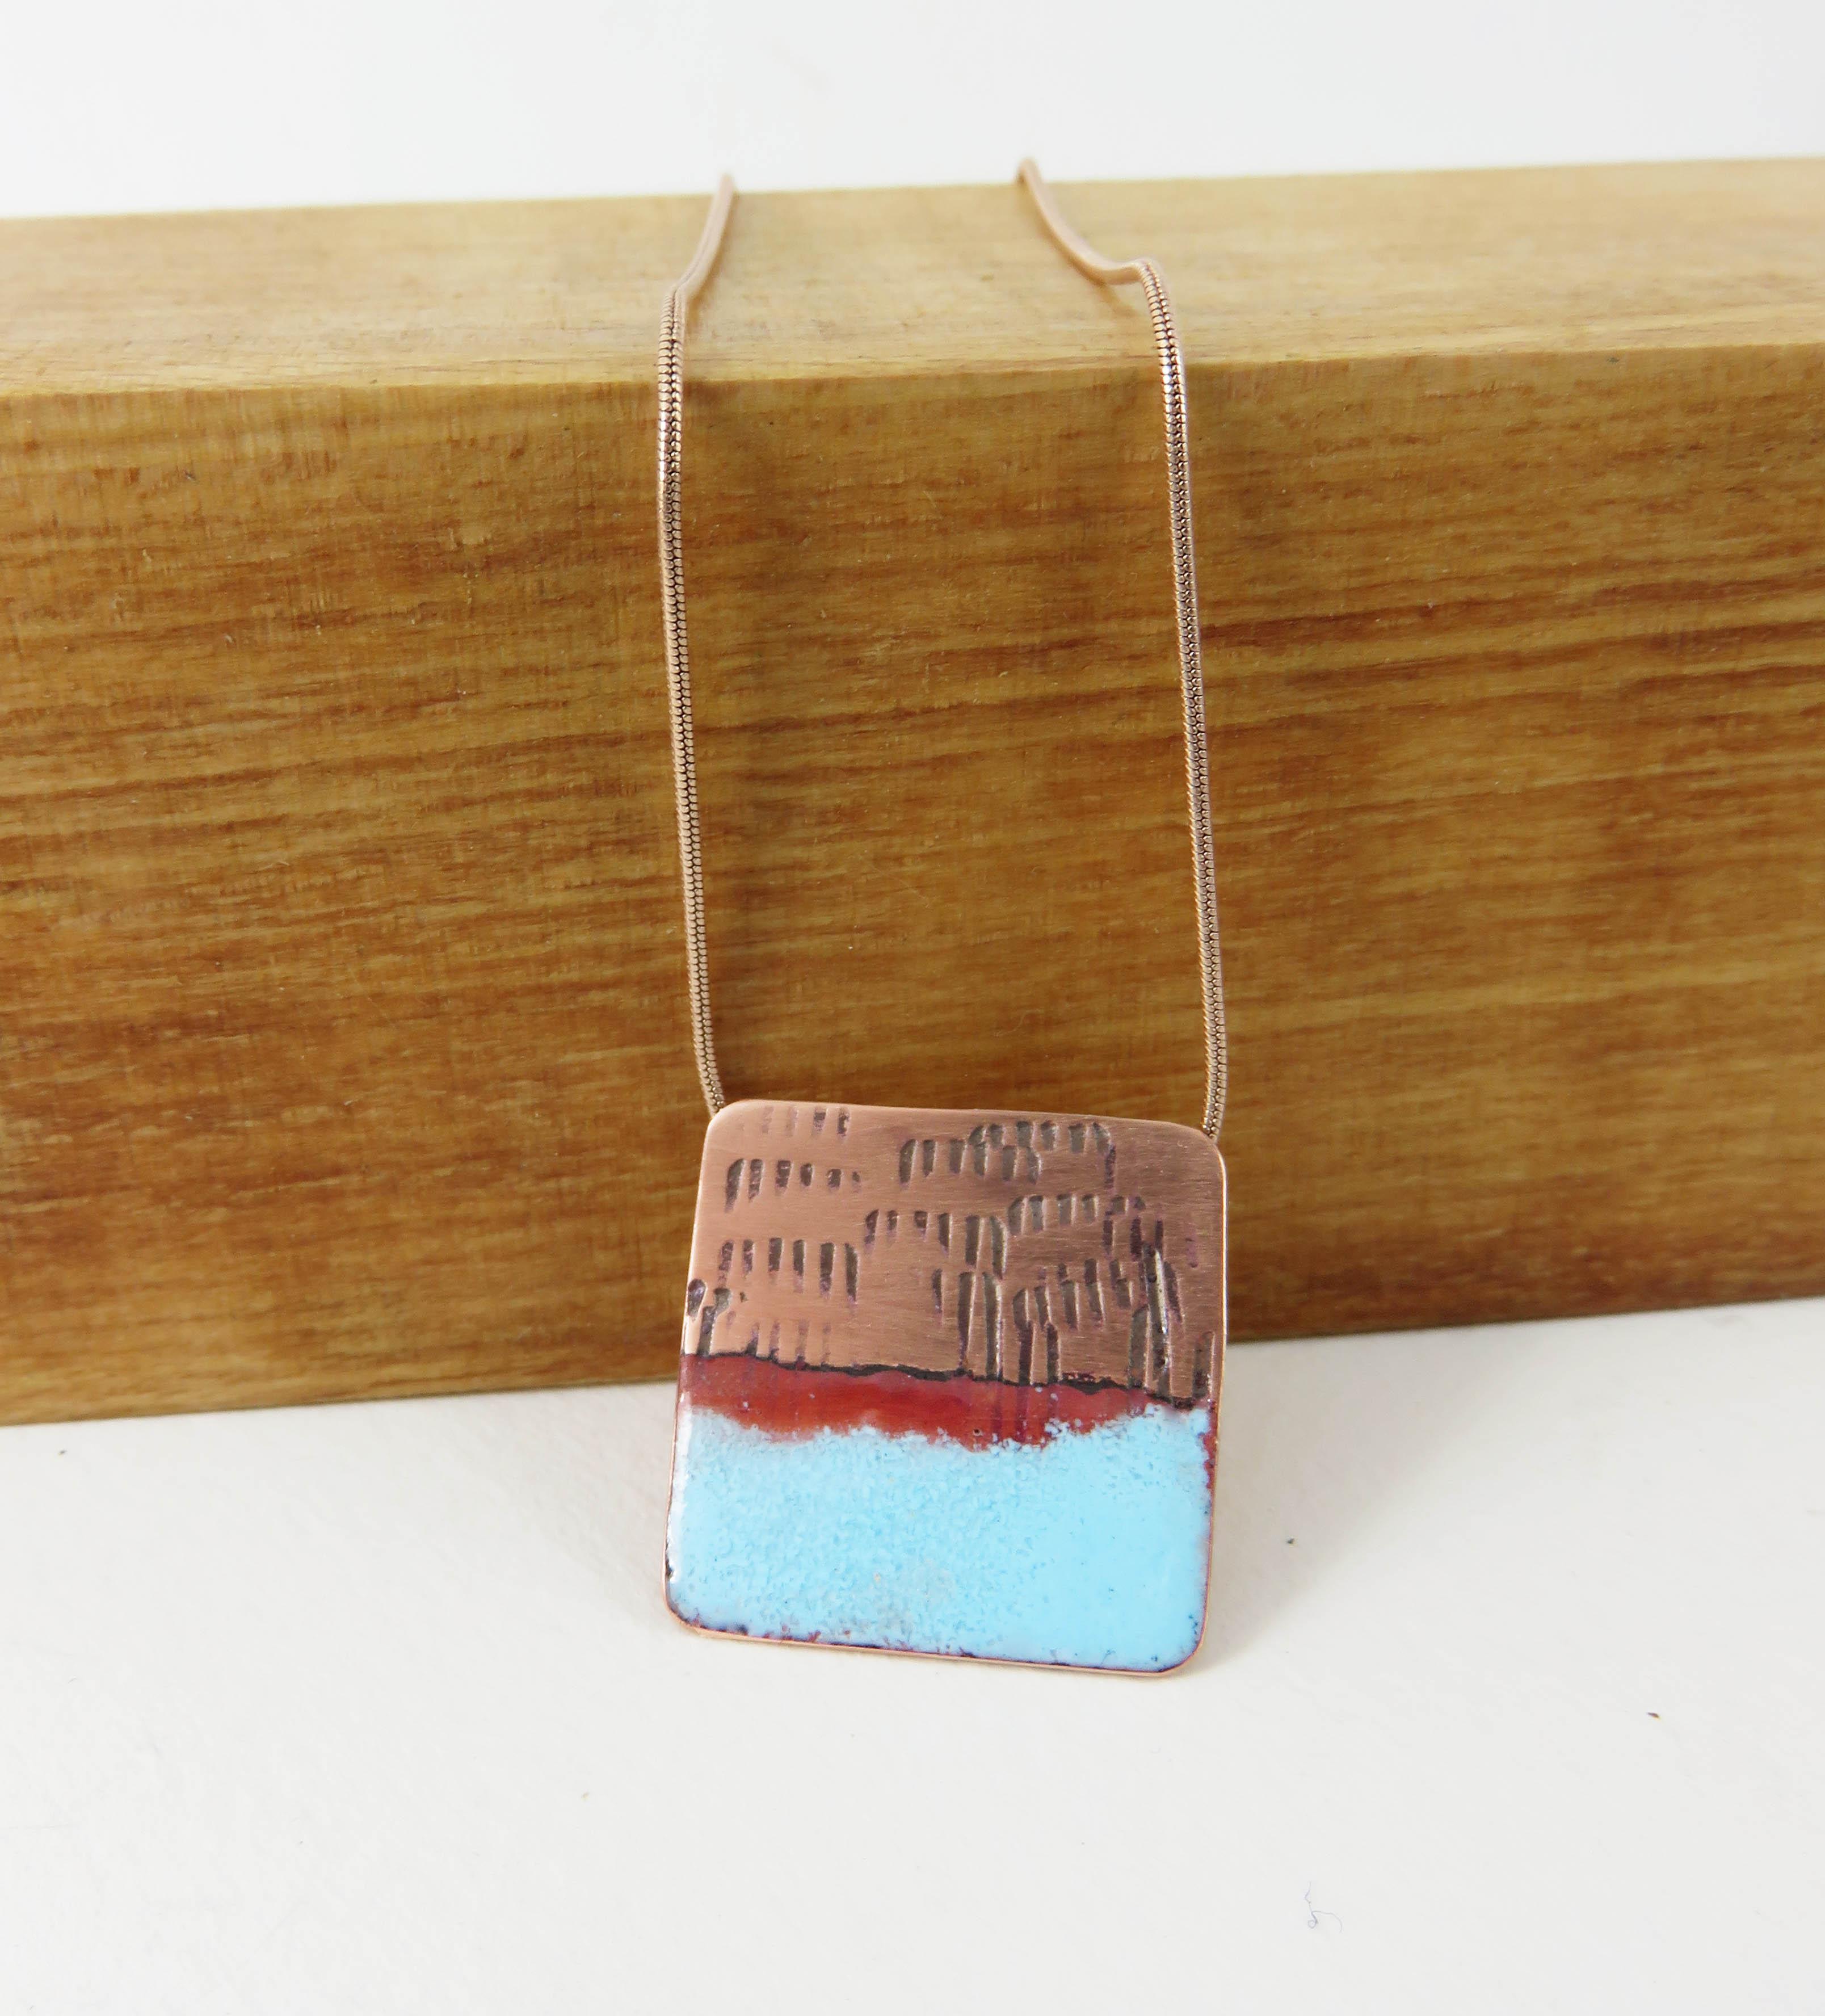 Square dipped pendant